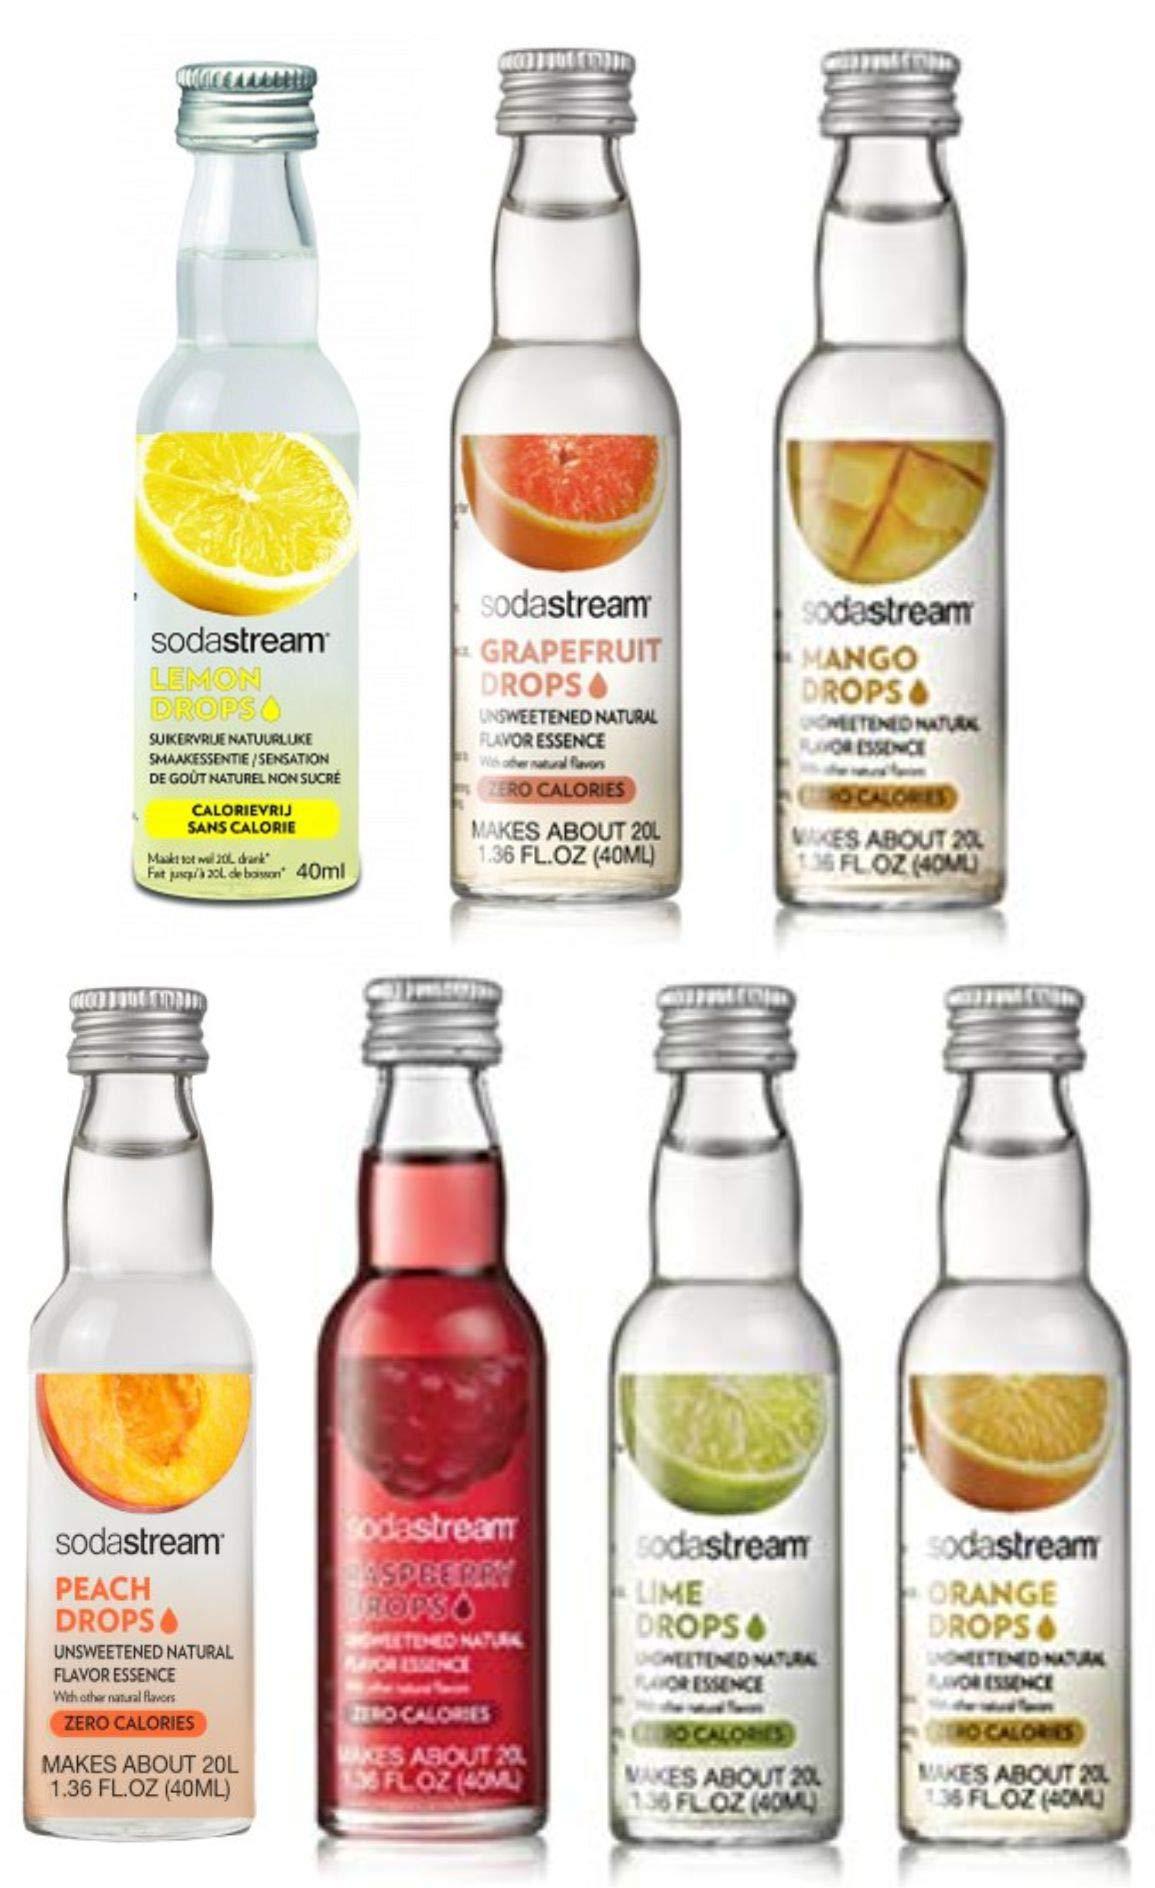 SodaStream Fruit Drops 7 Pack by MonstaDeals